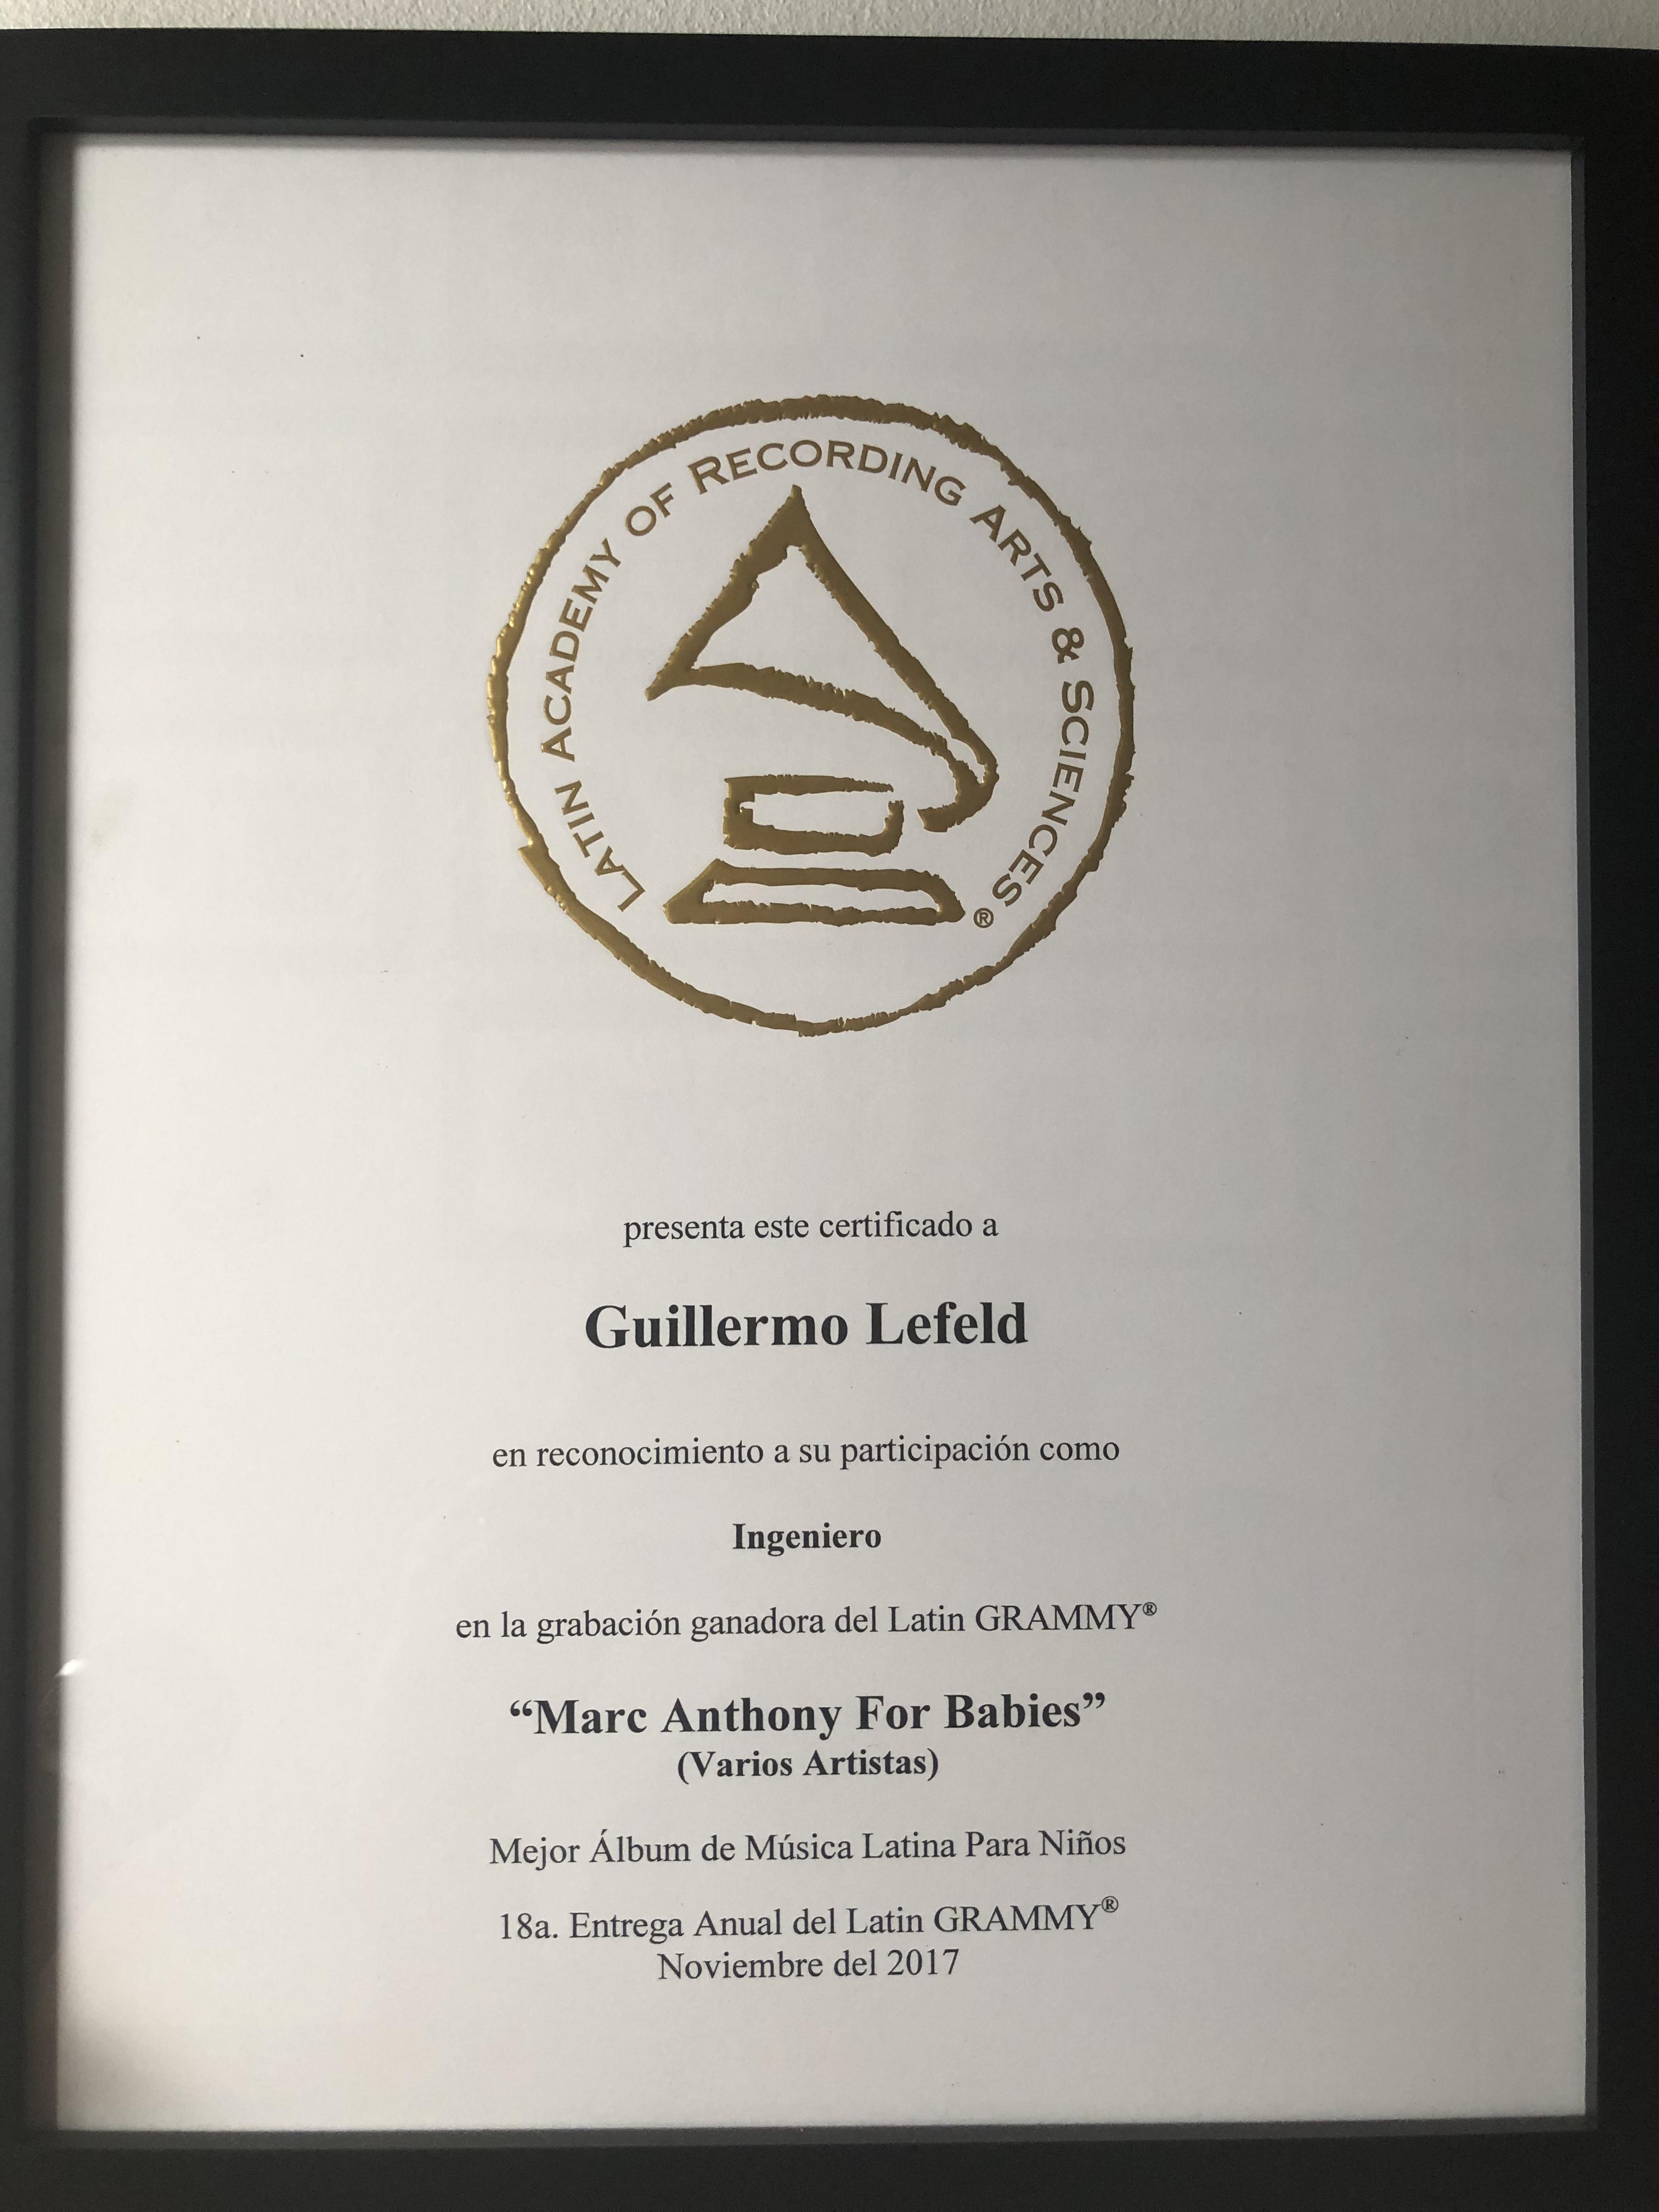 Grammy Certificate_2